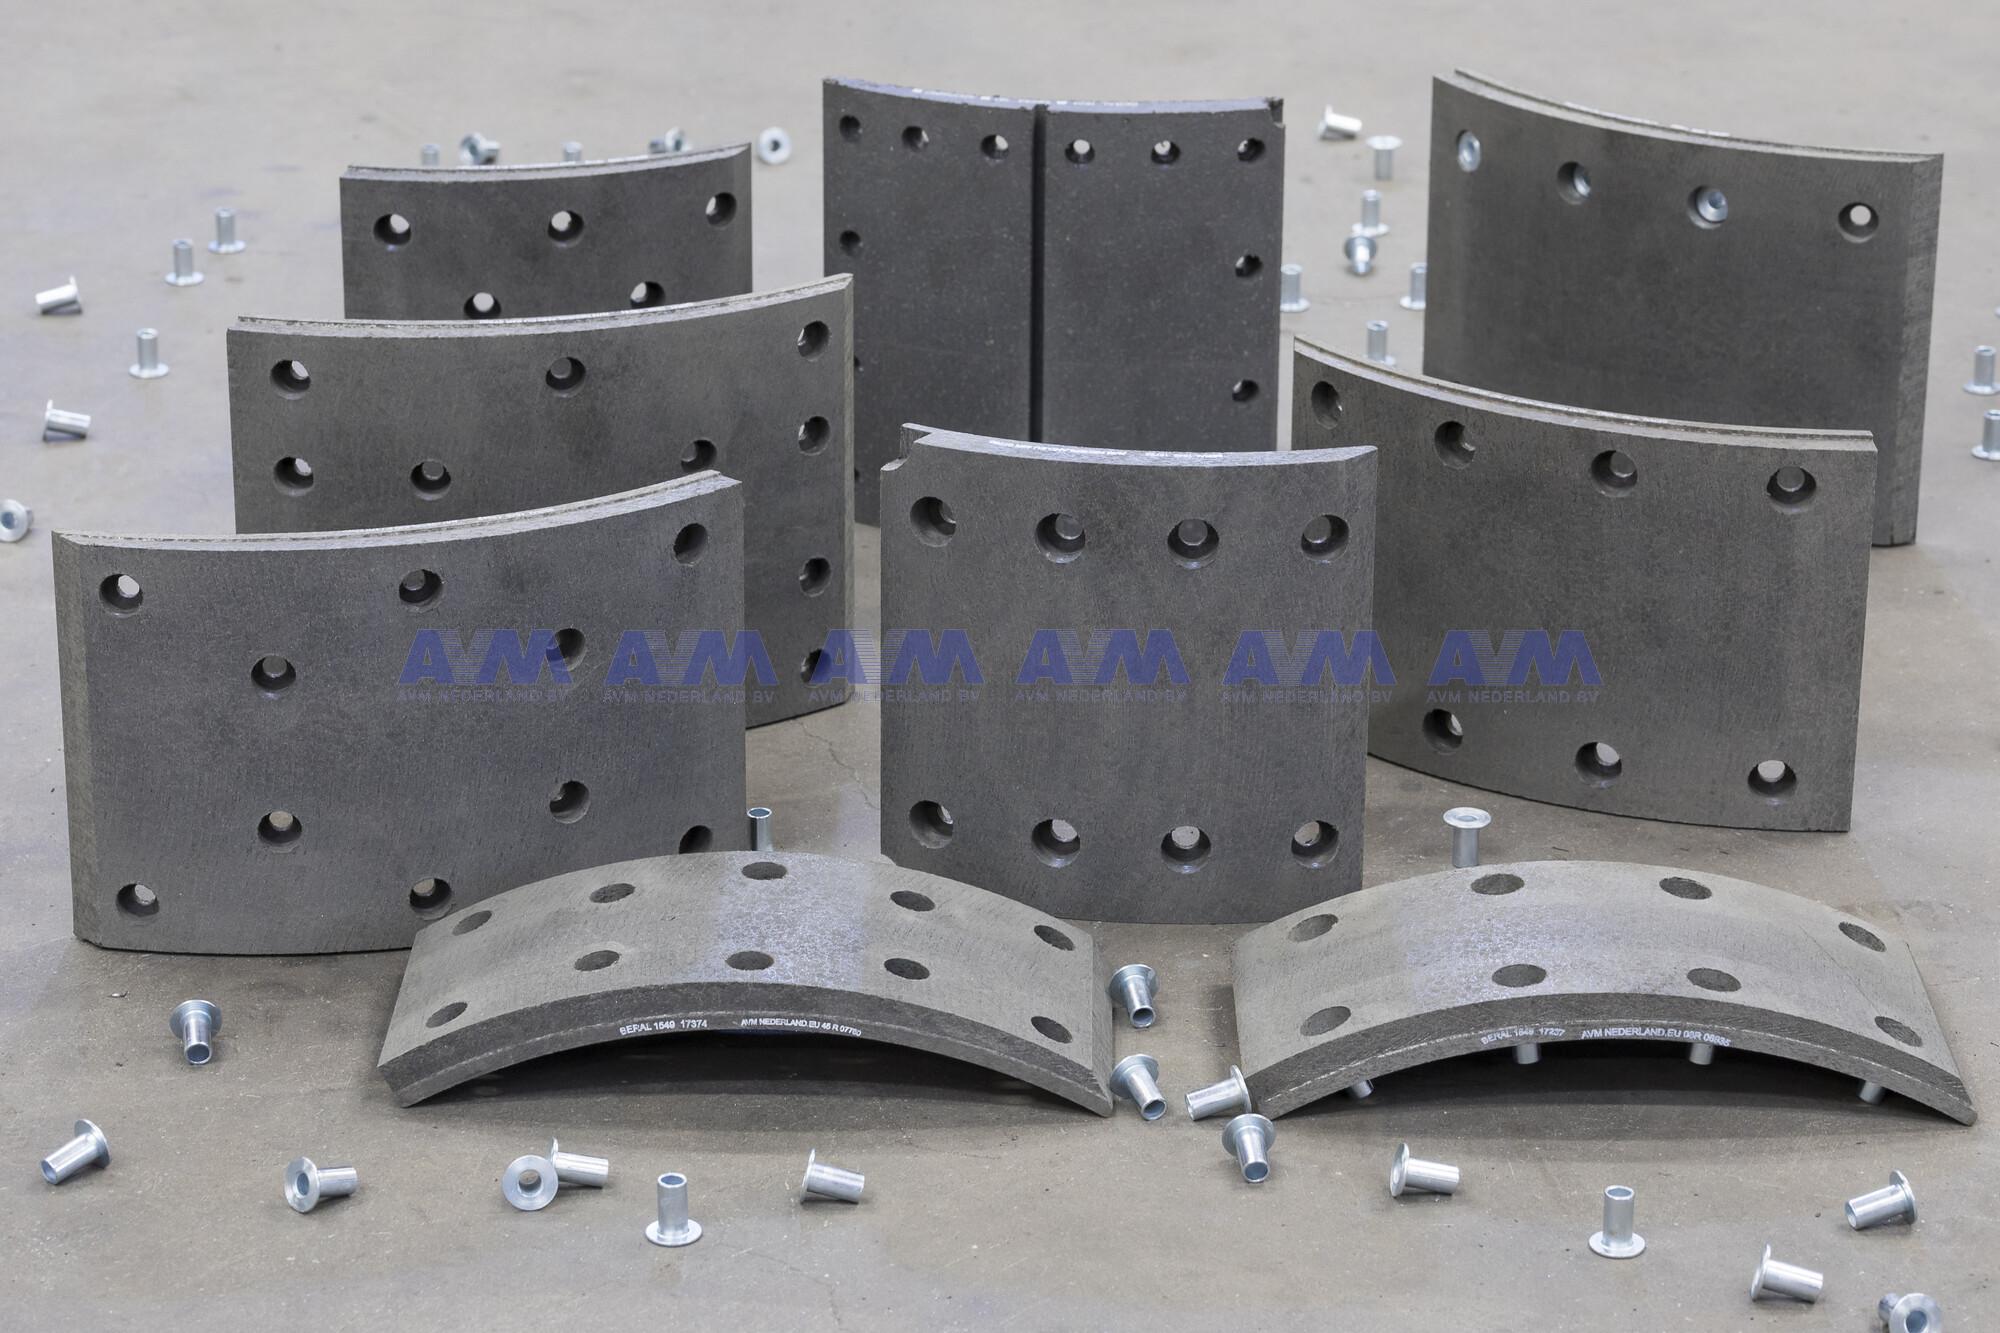 Remvoering 500x160 mm - 8 gaten RV-9687-00 AVM